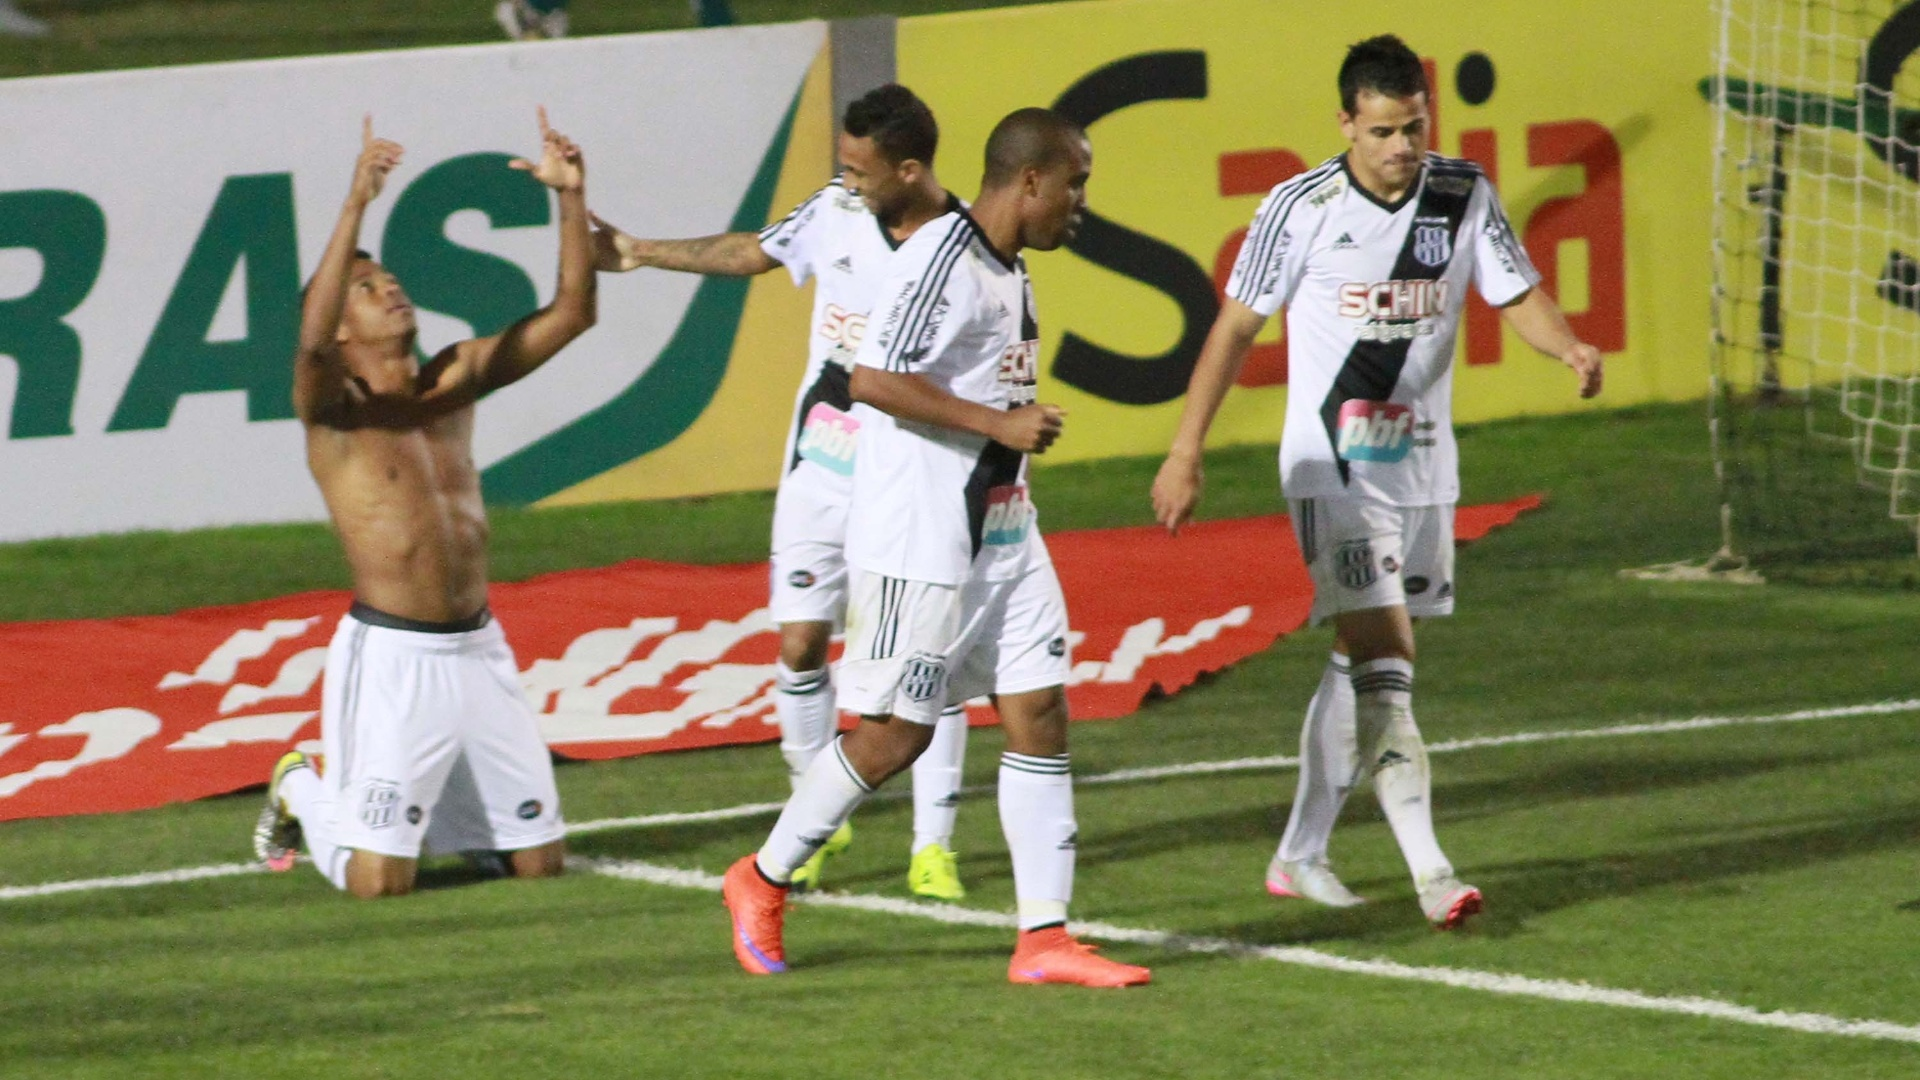 Jogadores da Ponte Preta comemoram gol marcado contra o Coritiba, na Copa do Brasil